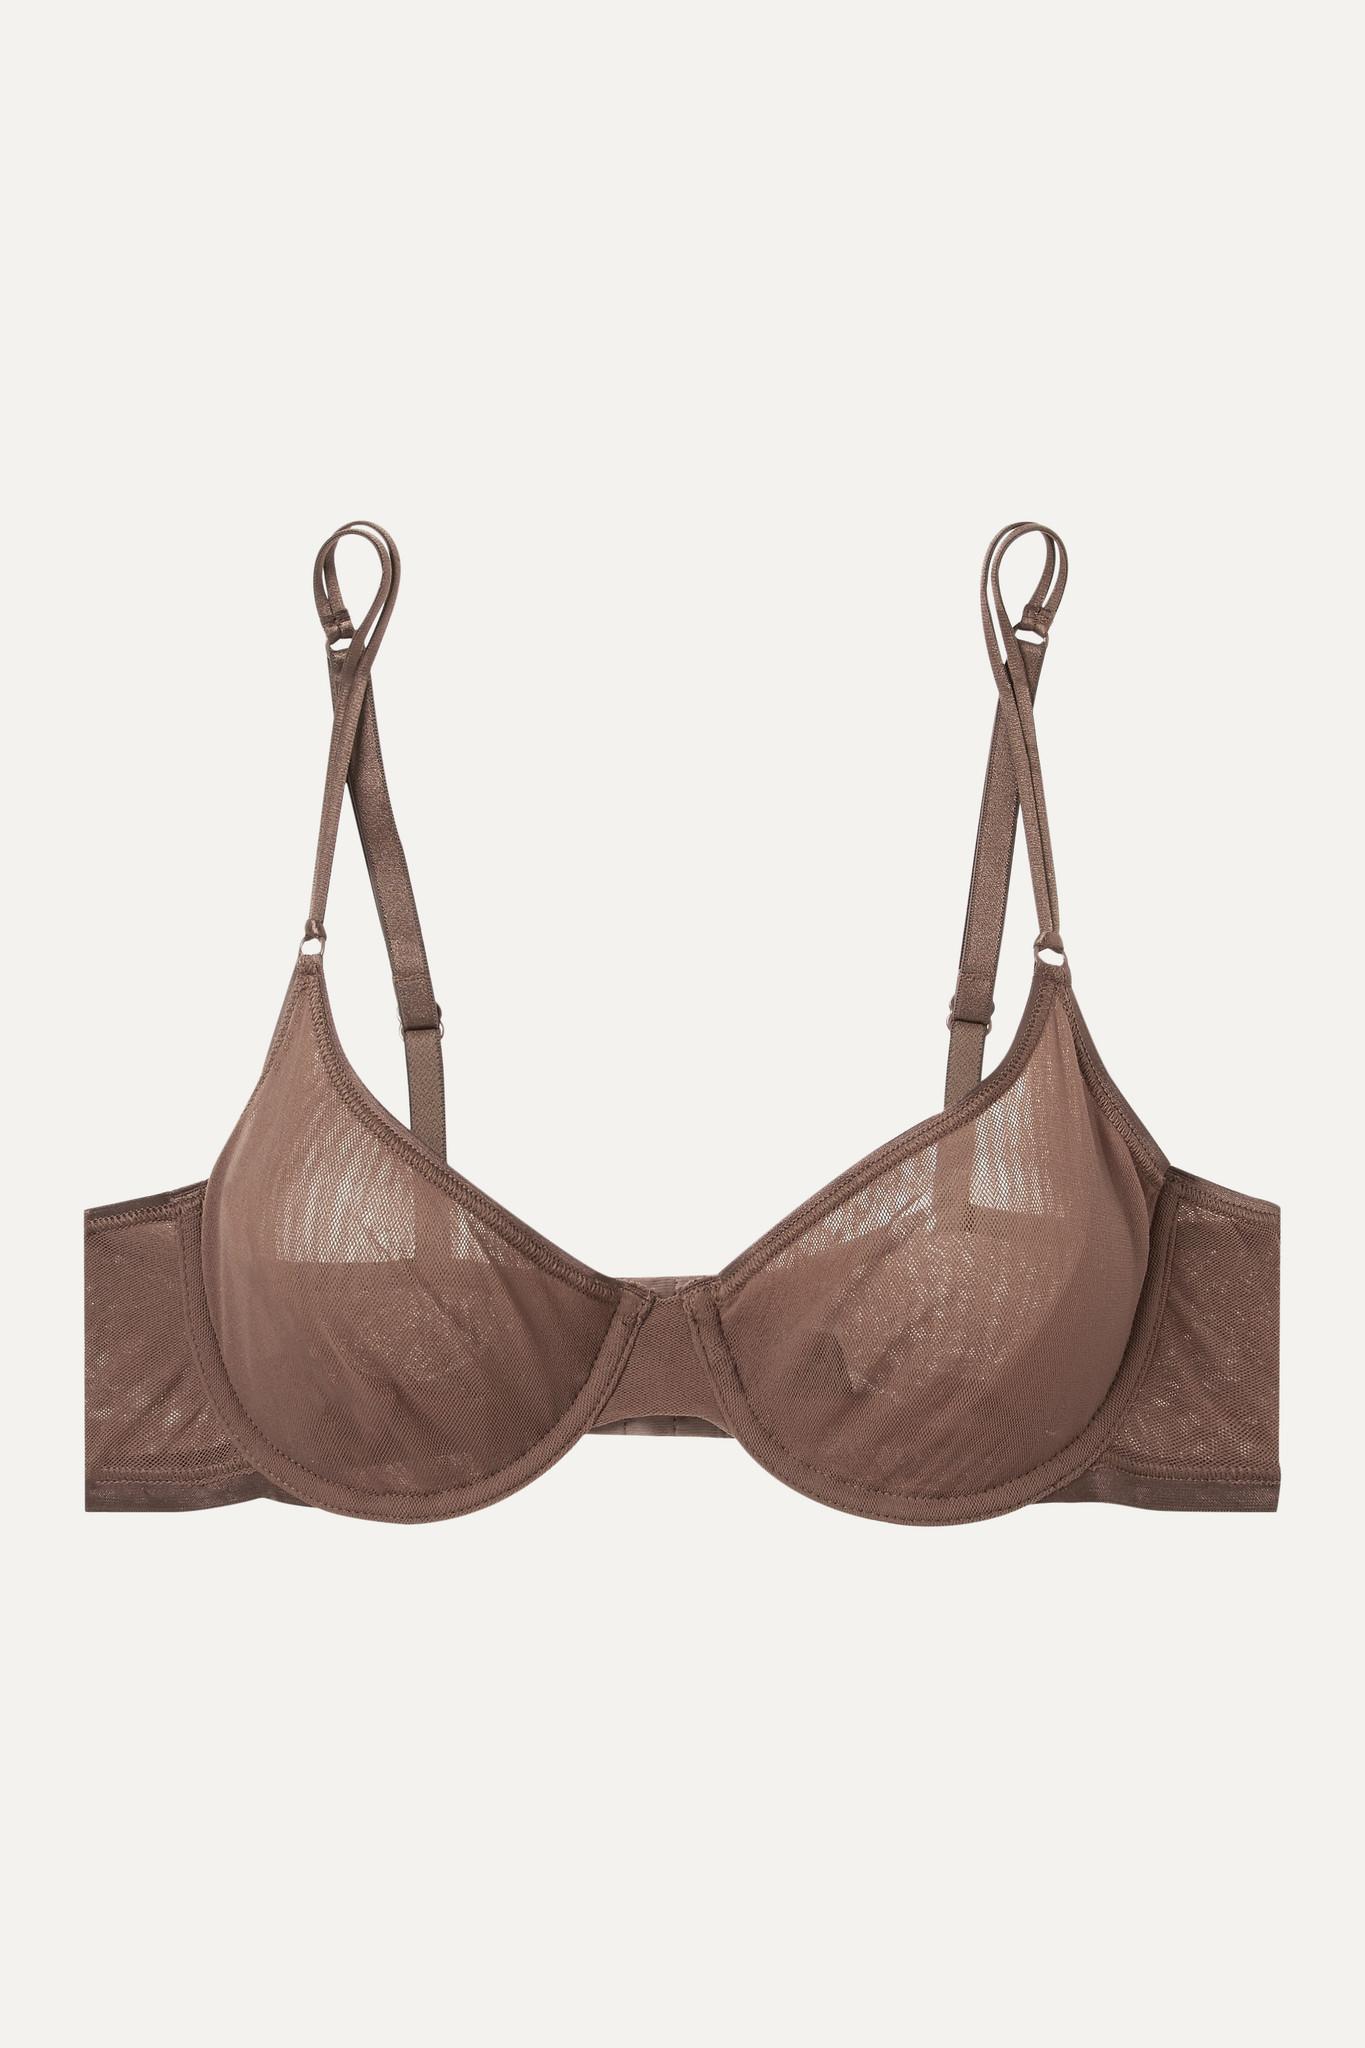 COSABELLA - Soiré Confidence 网布带钢圈软杯文胸 - 棕色 - 32C